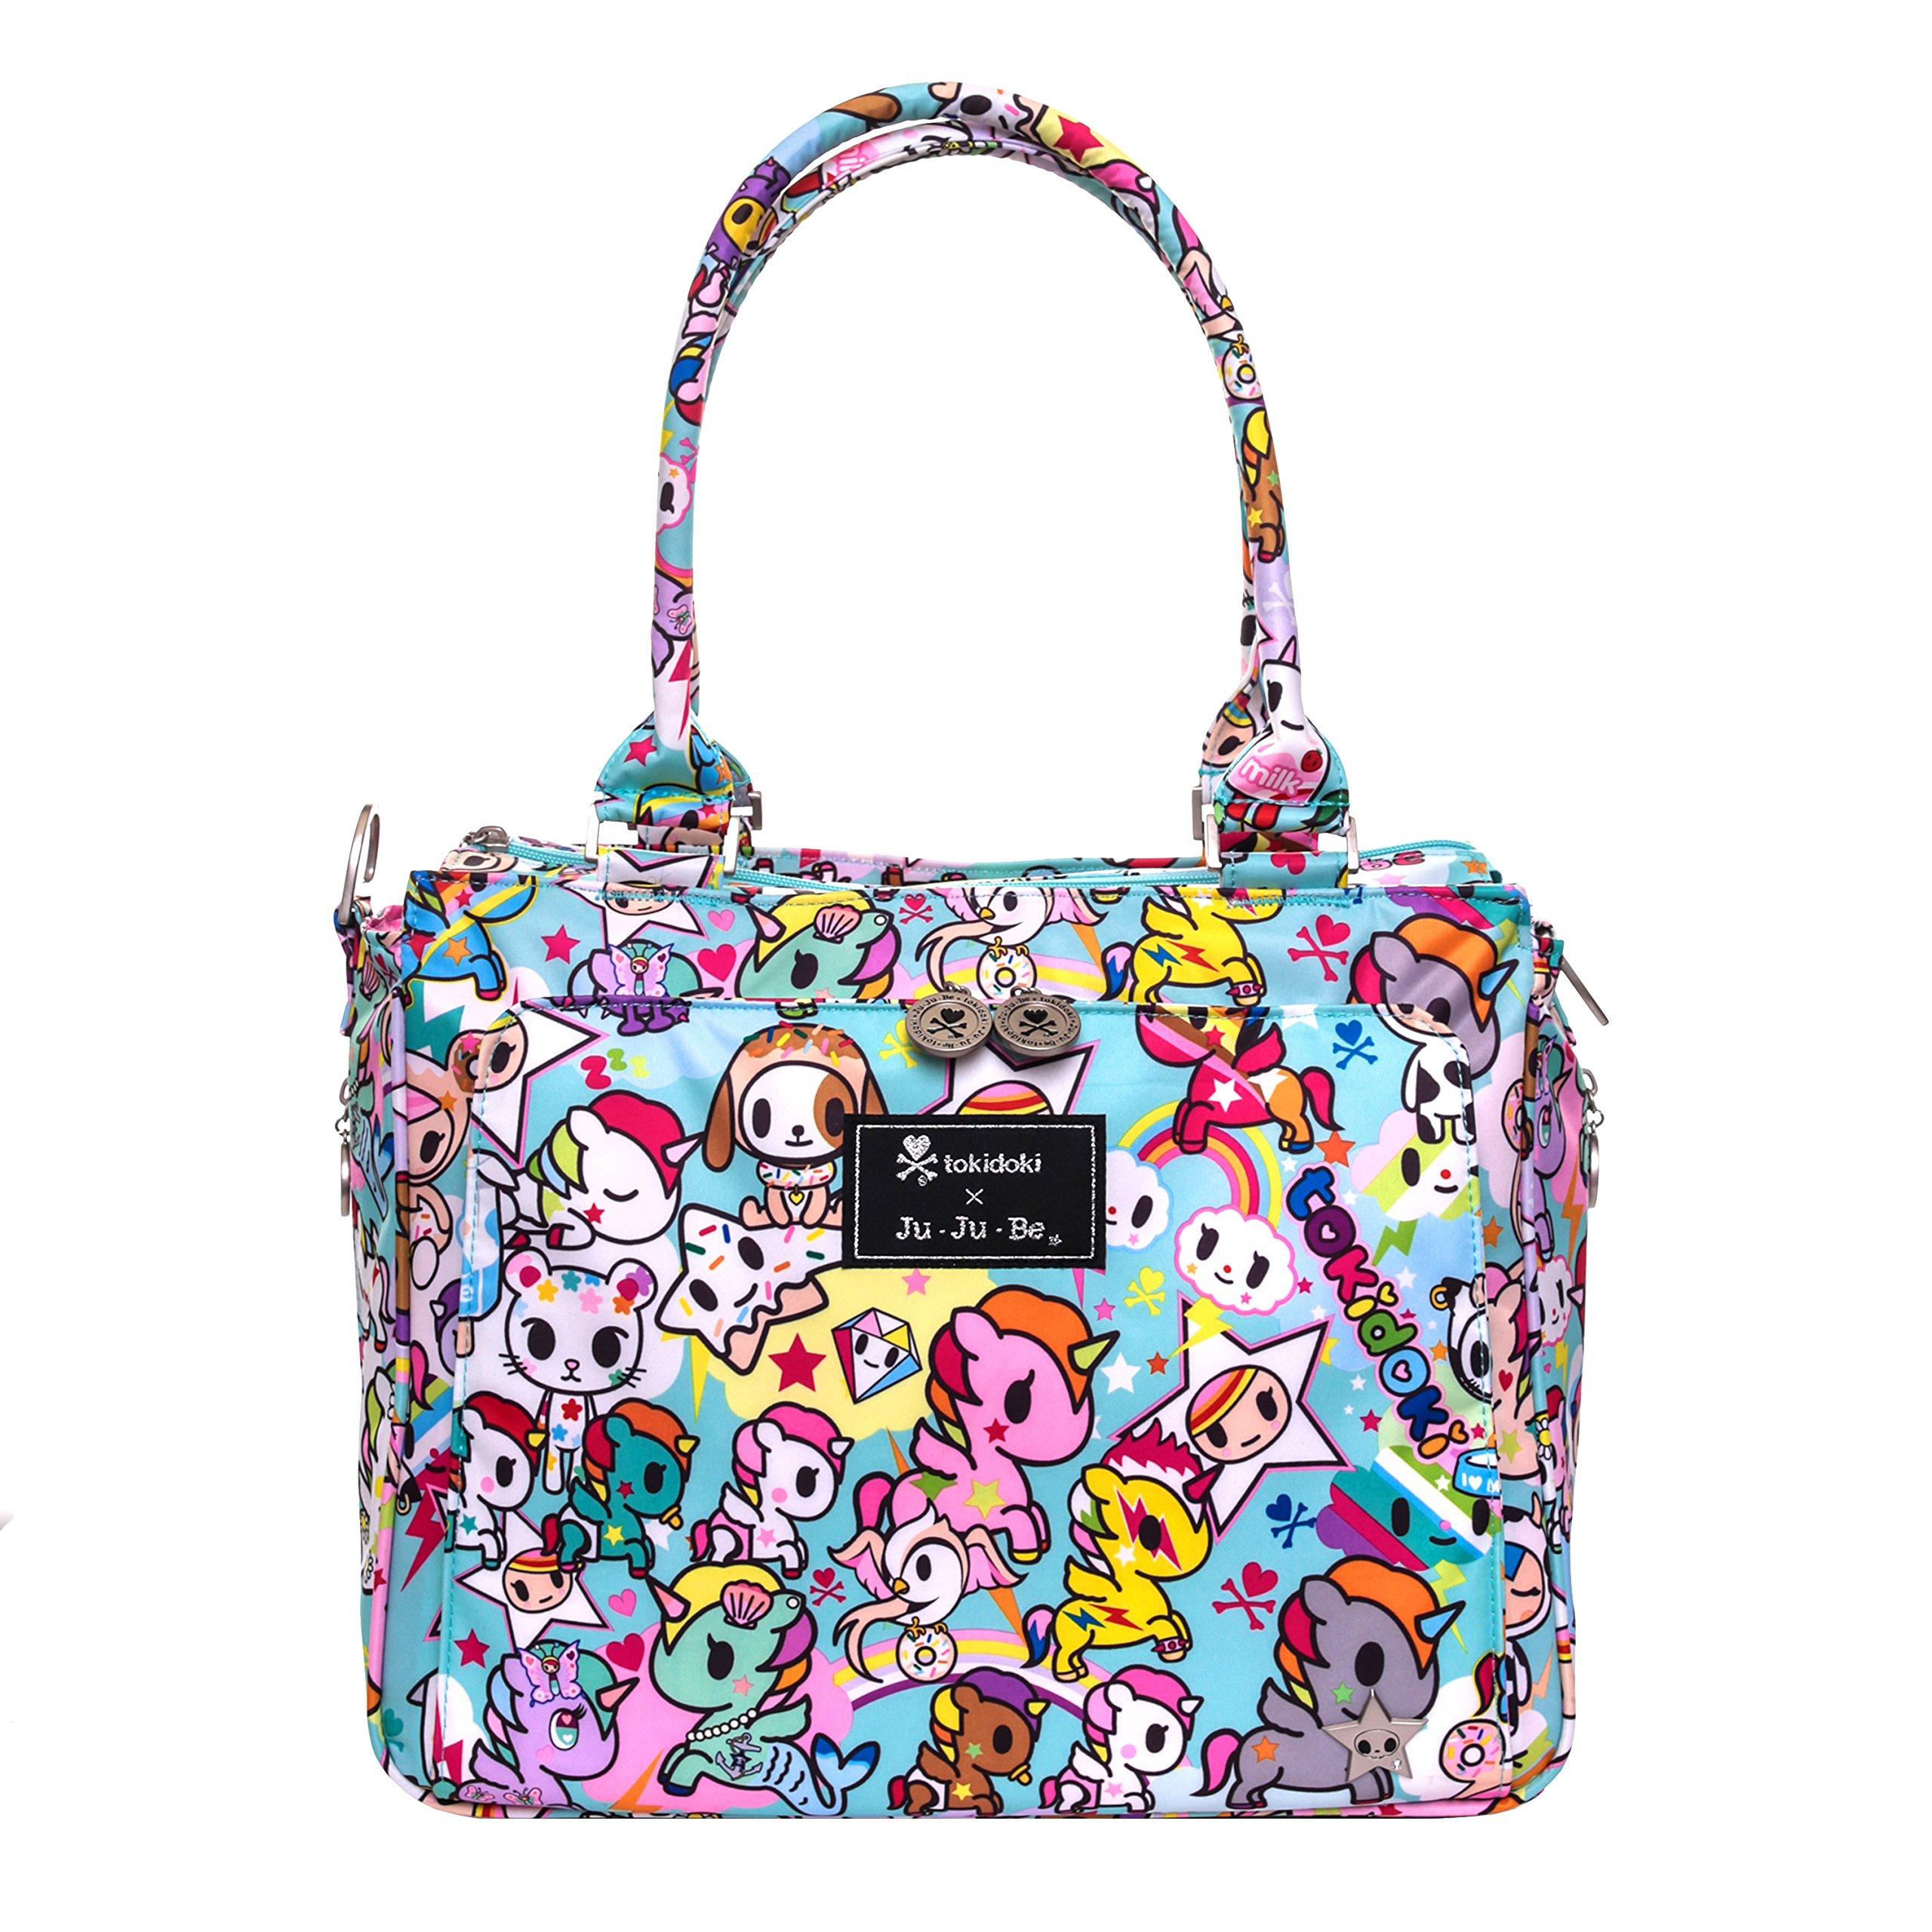 Ju-Ju-Be Be Classy Structured Handbag Diaper Bag - Tokidoki Unikiki 2.0